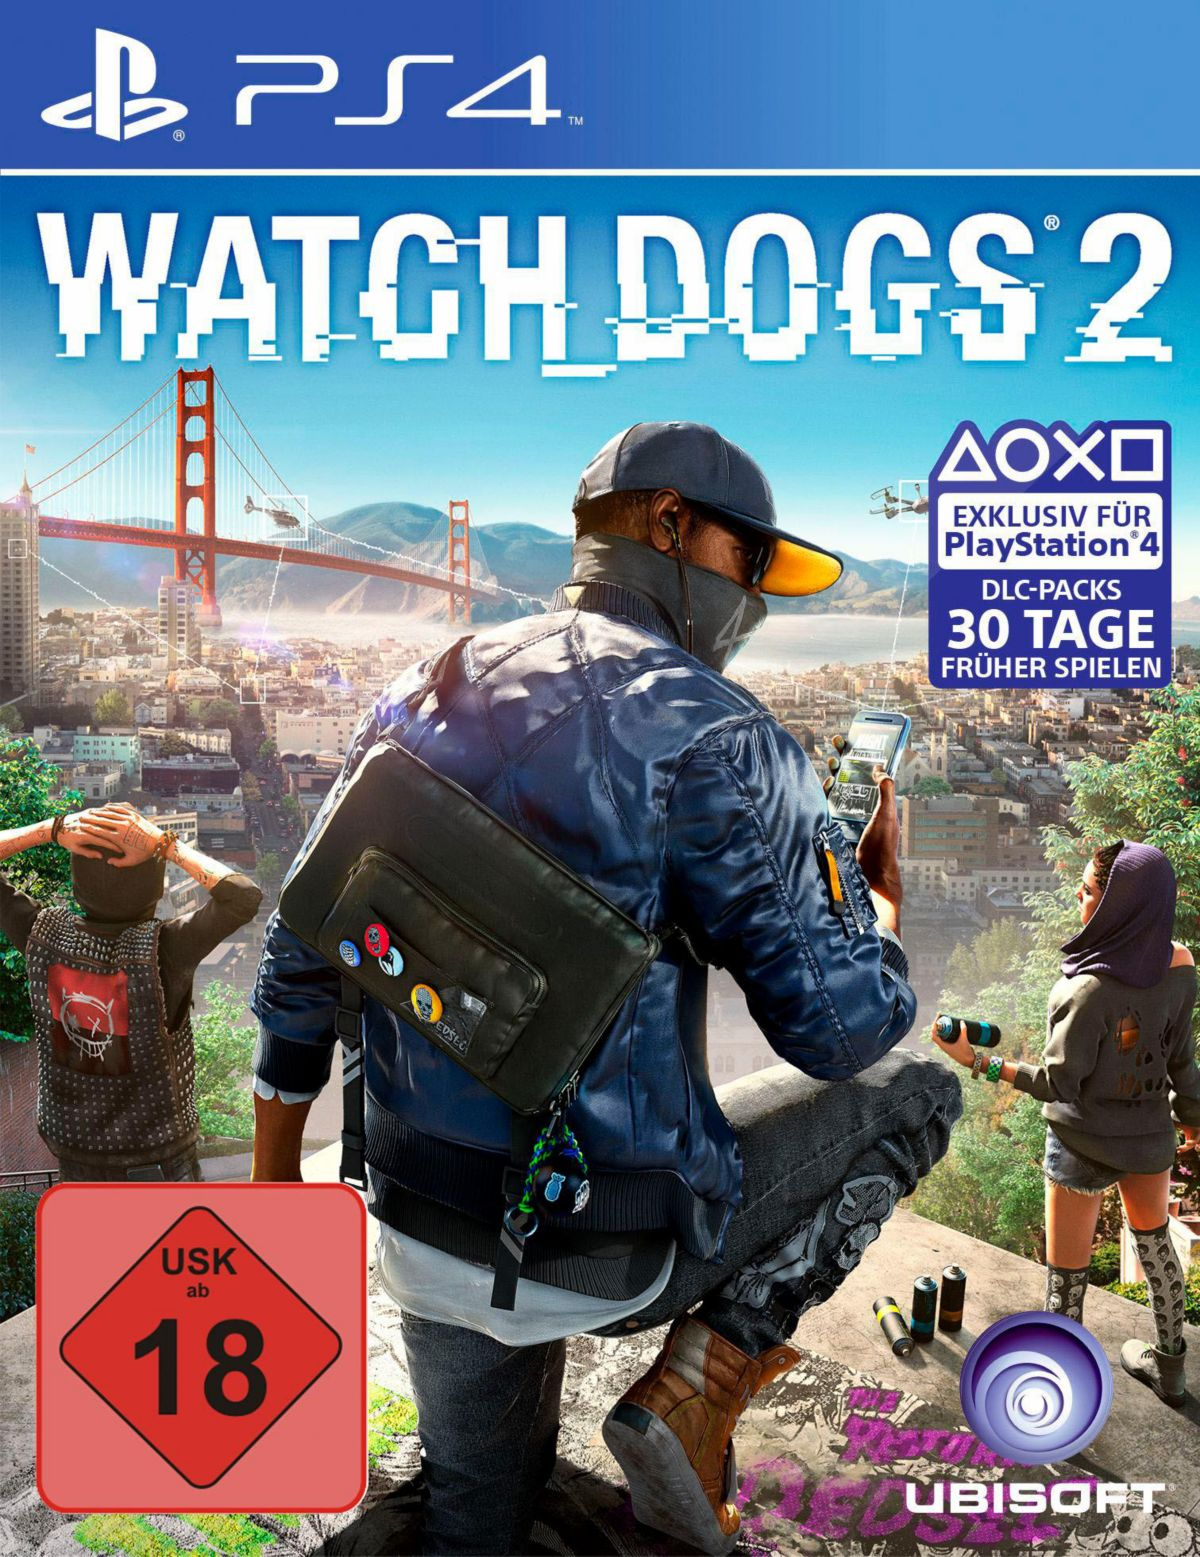 Aktuelle Angebote Kaufroboter Die Discounter Suchmaschine Ps 4 Slim New 500gb Fw 505 Watch Dogs 2 Playstation